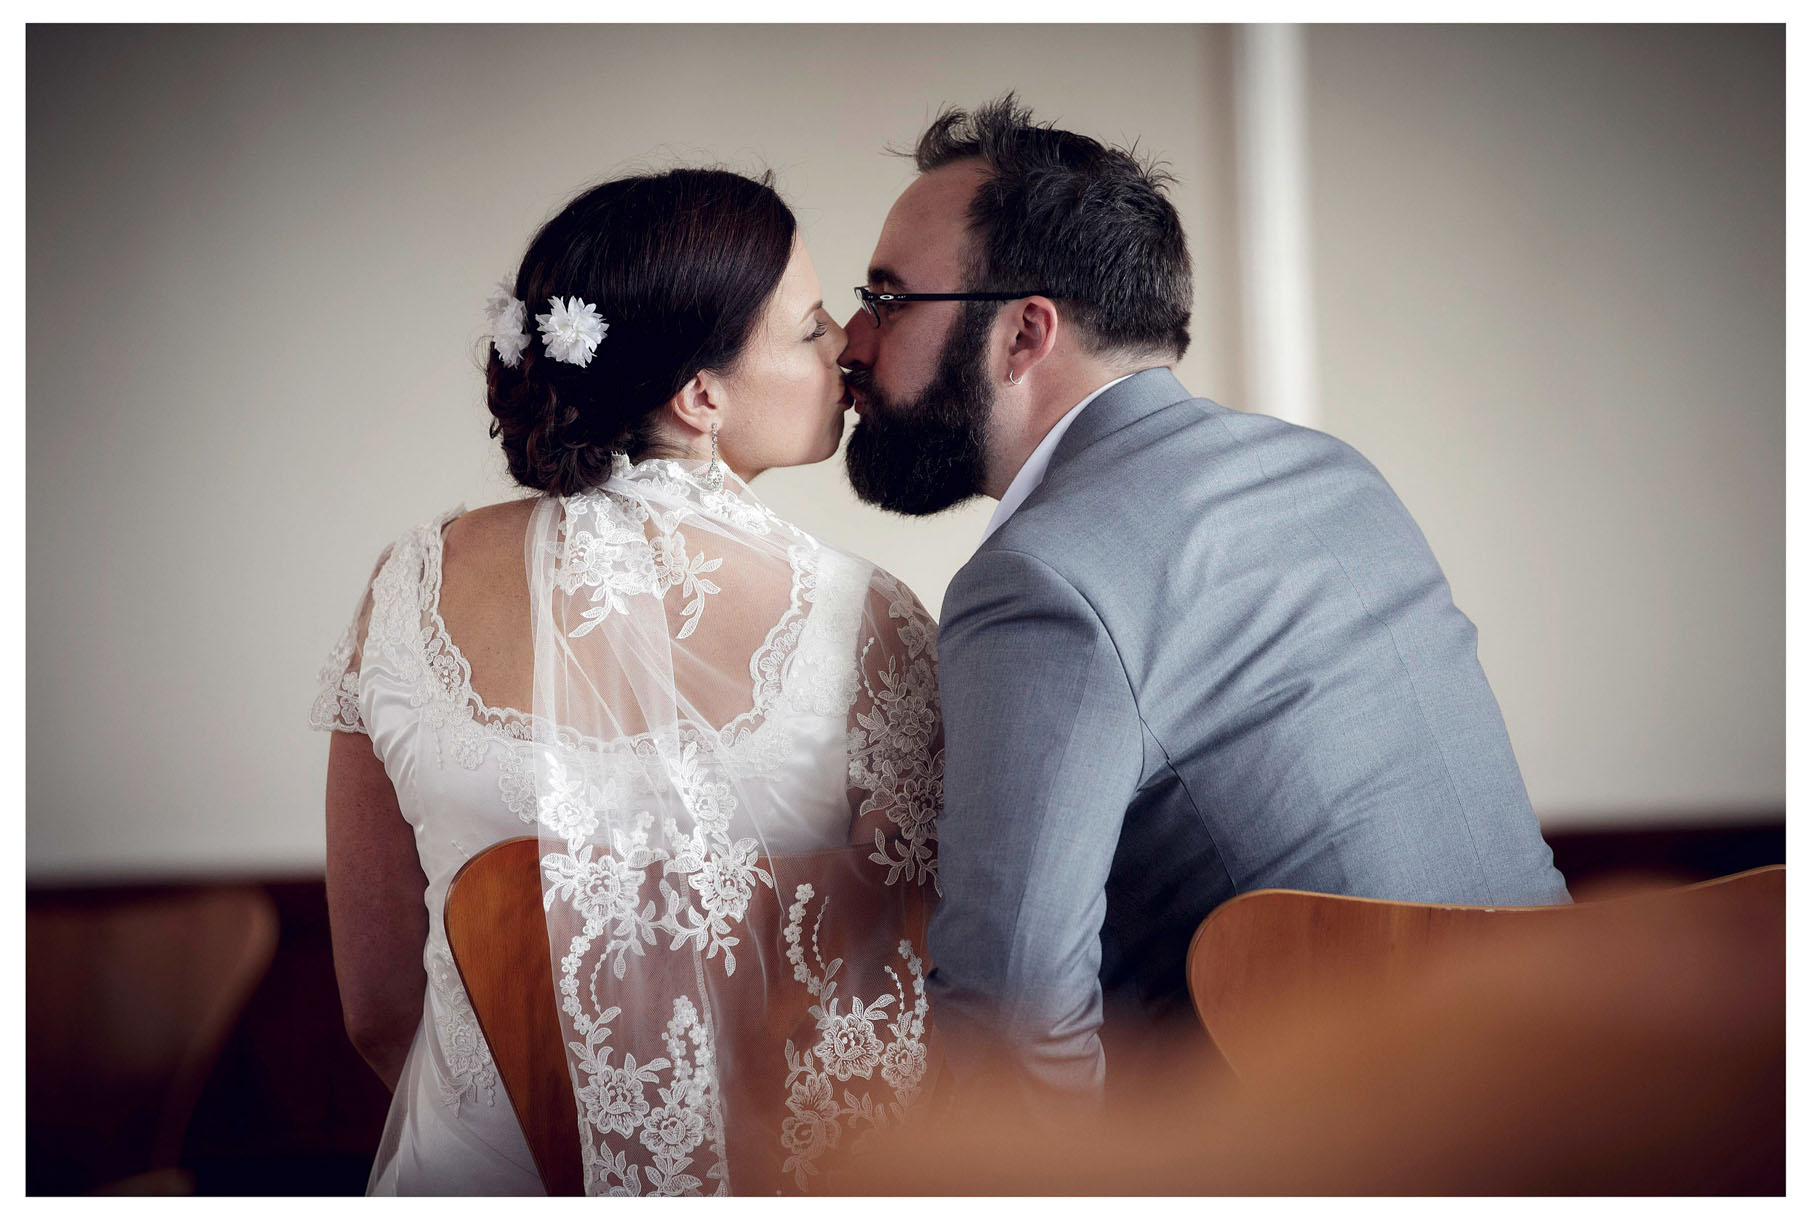 wedding photograph by Auckland wedding photographer Chris Loufte www.theweddingphotographer.co.nz Hopetoun Alpf Auckland Central